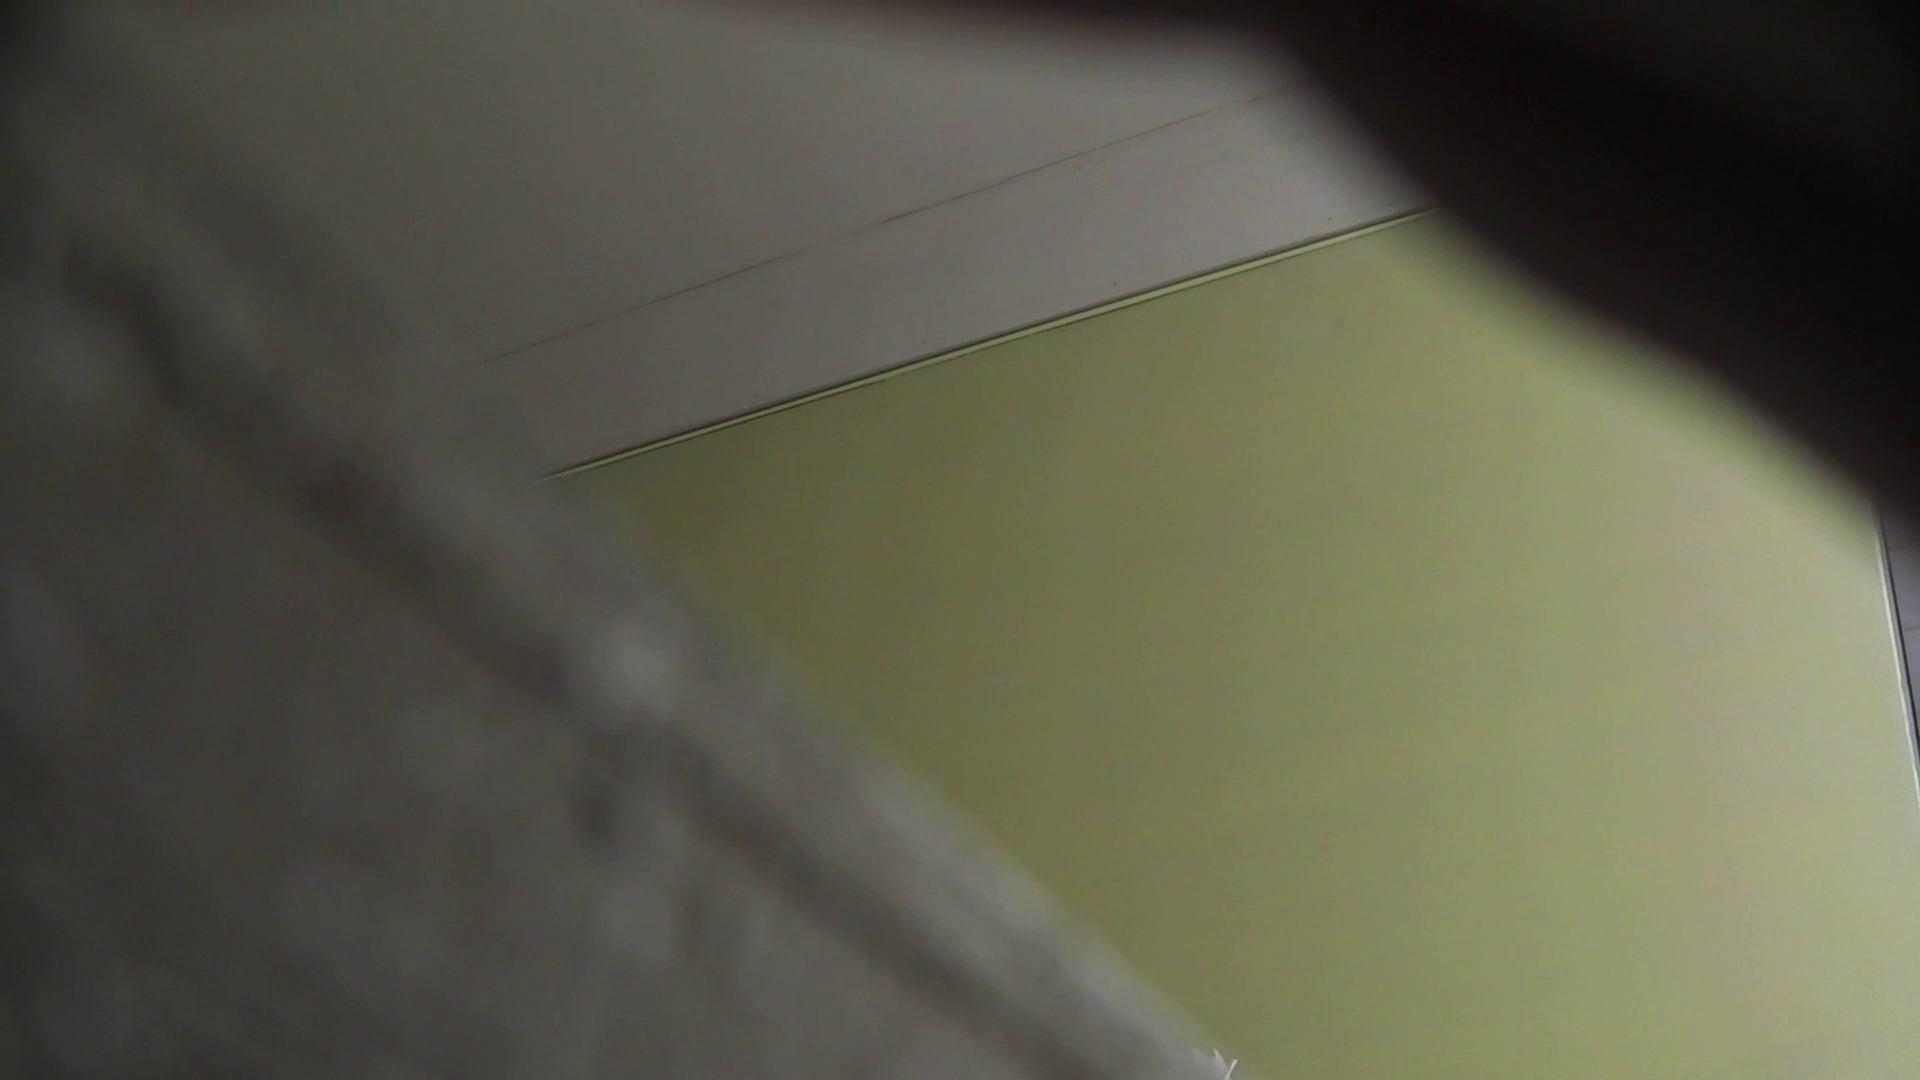 洗面所特攻隊 vol.001 清楚な美脚さん 洗面所 性交動画流出 89連発 83